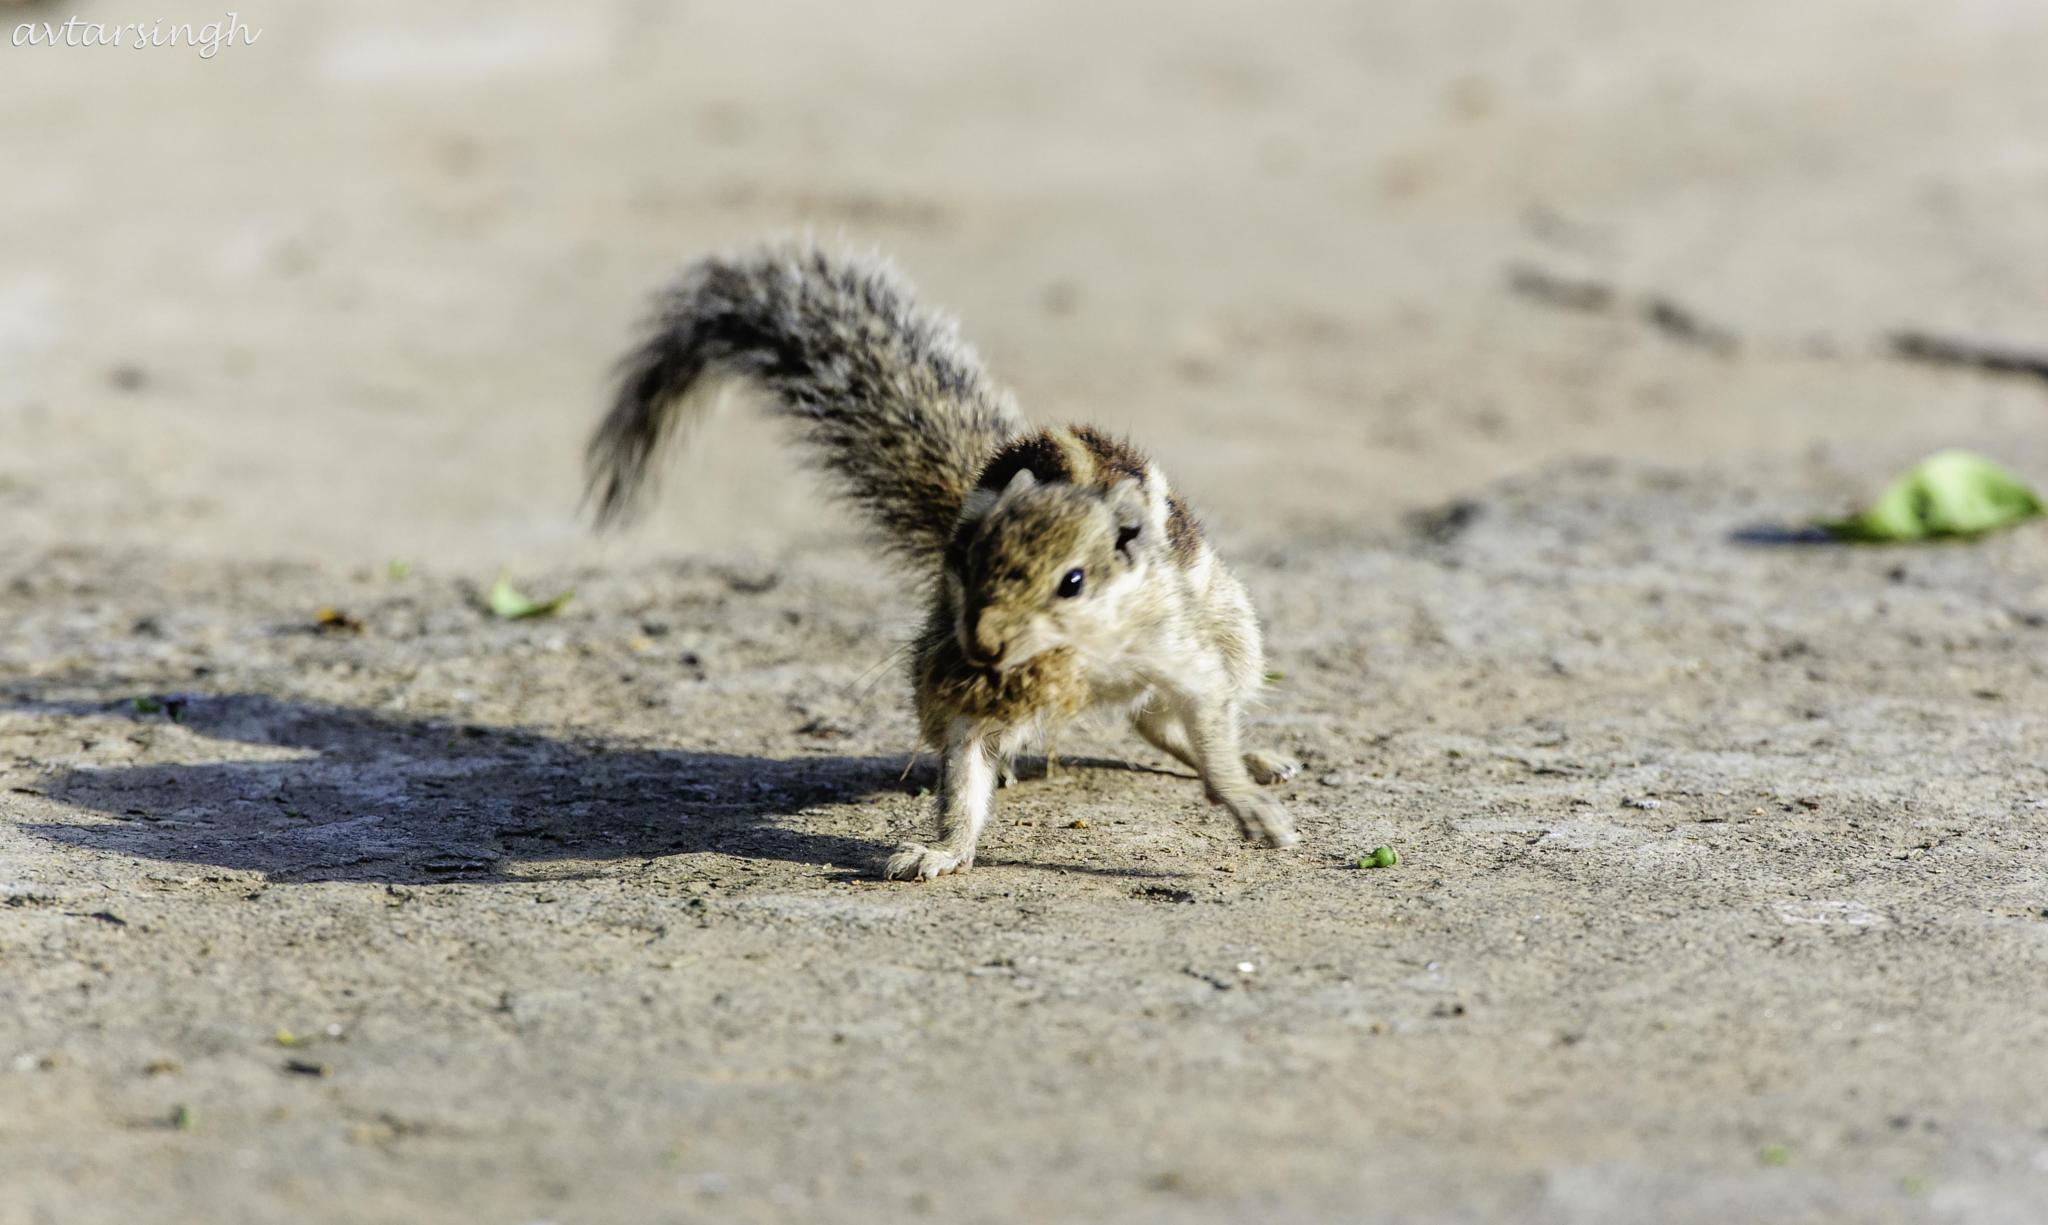 Palm Squirrel by Avtar Singh